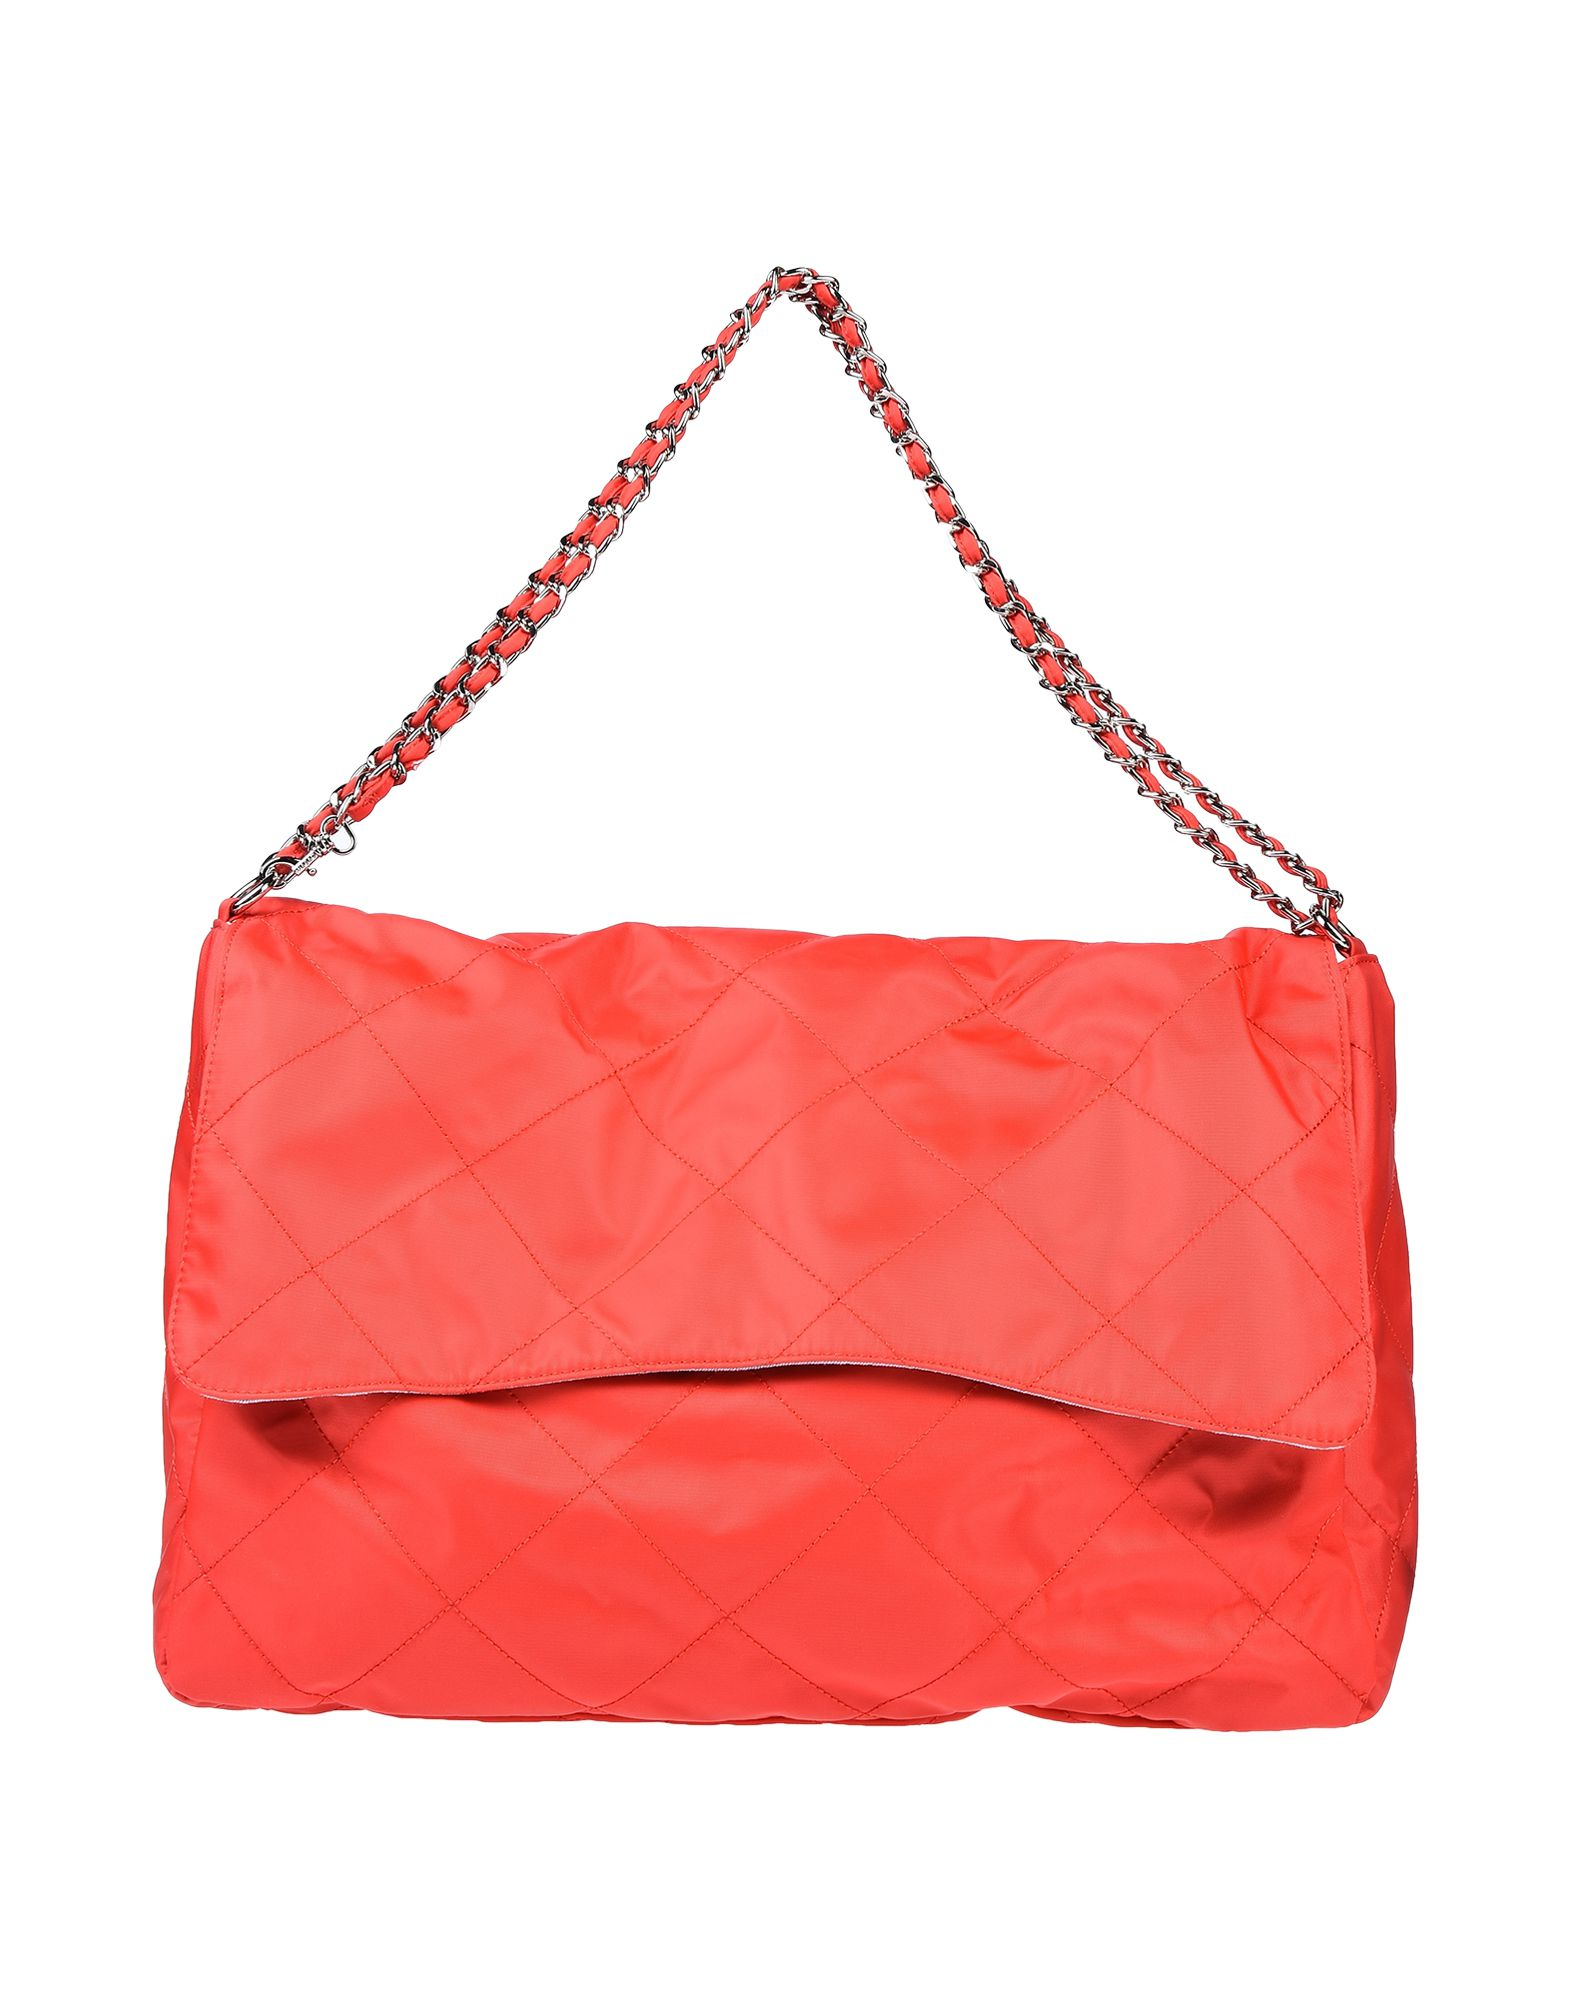 Фото - MIA BAG Сумка на плечо 2017 luxury brand women handbag oil wax leather vintage casual tote large capacity shoulder bag big ladies messenger bag bolsa